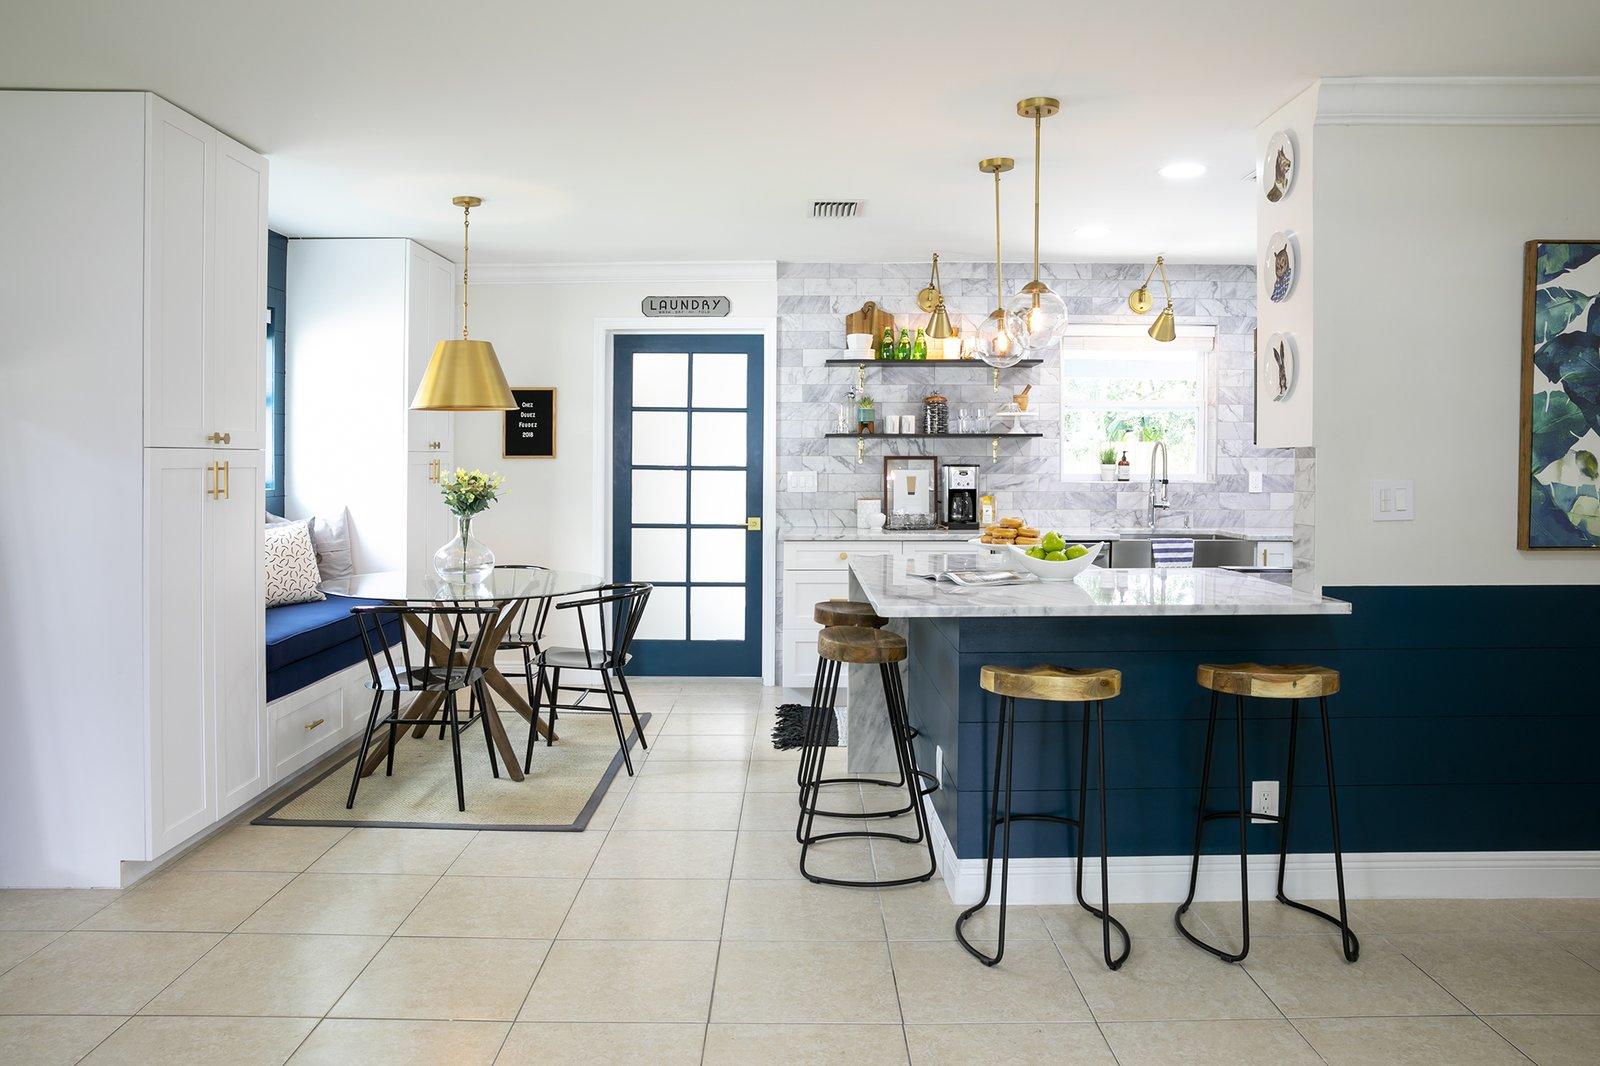 5 Kitchen Renovations Under $100k